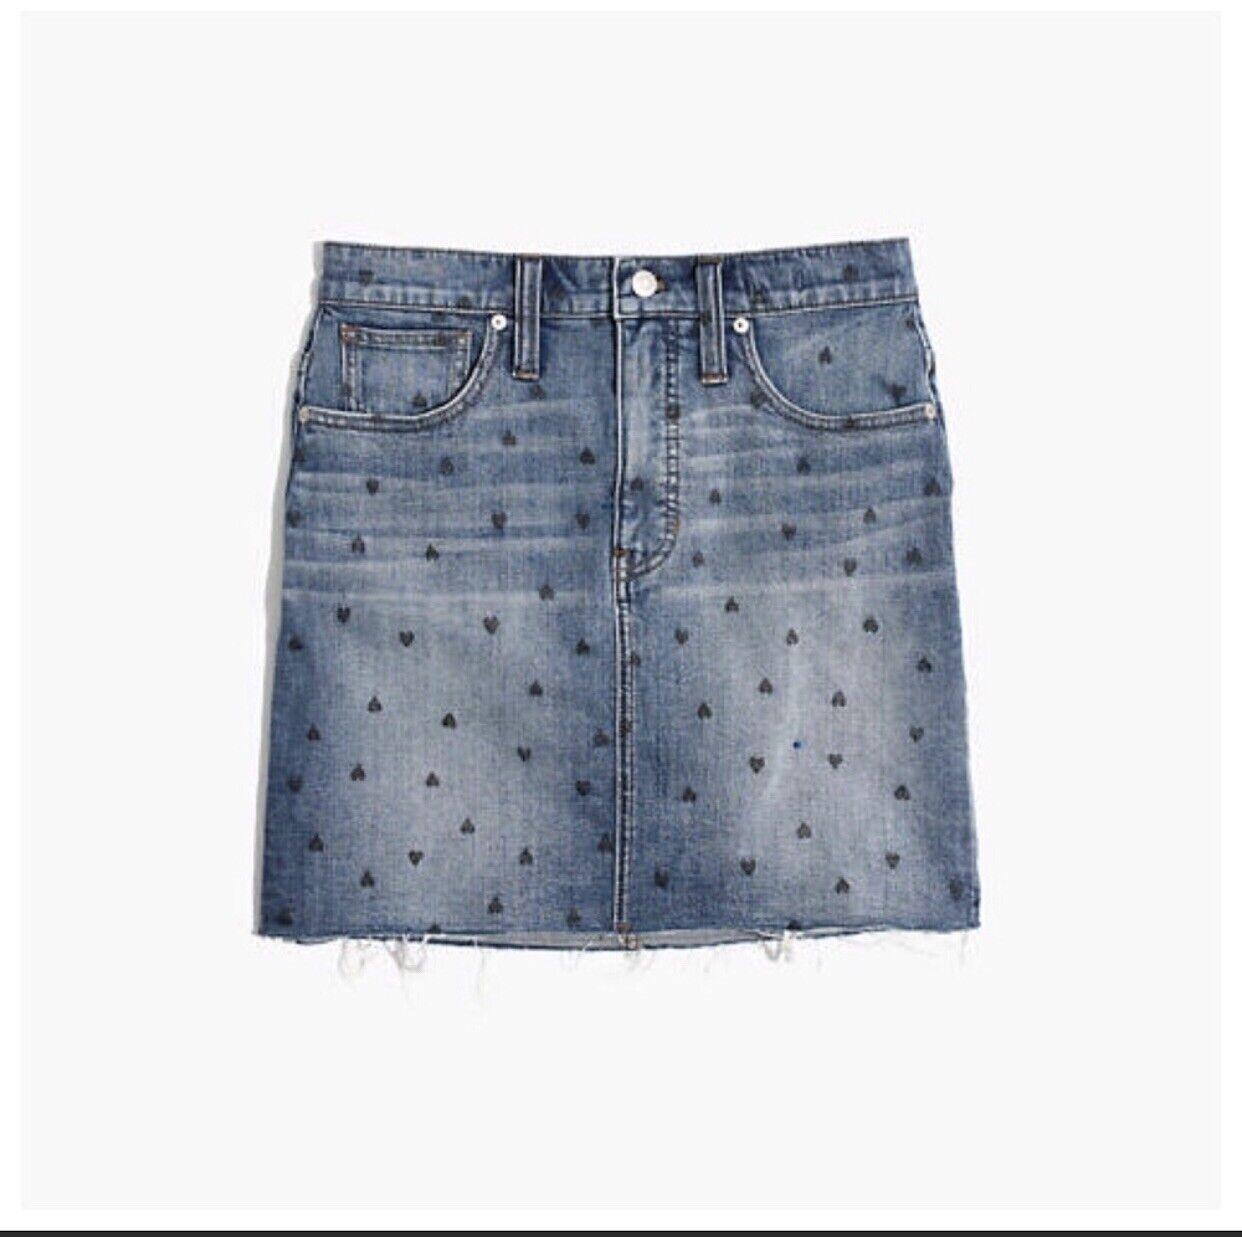 NWT Madewell Stretch Denim Straight Mini Skirt Heart Print Edition Sz 29